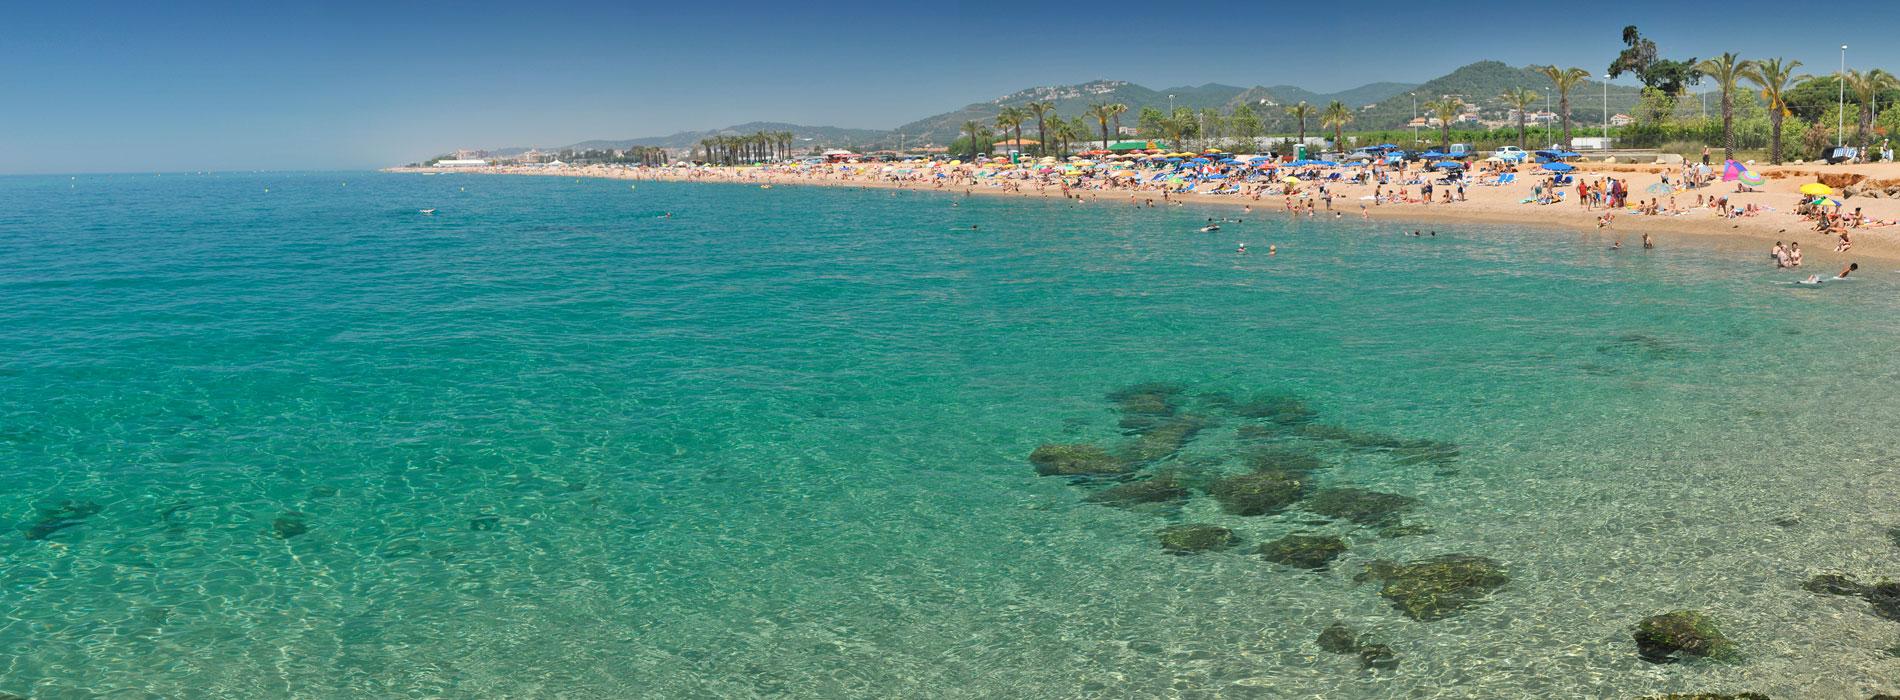 Hotel Checkin Sirius **** SUP | Santa Susanna - Barcelona | Web Oficial